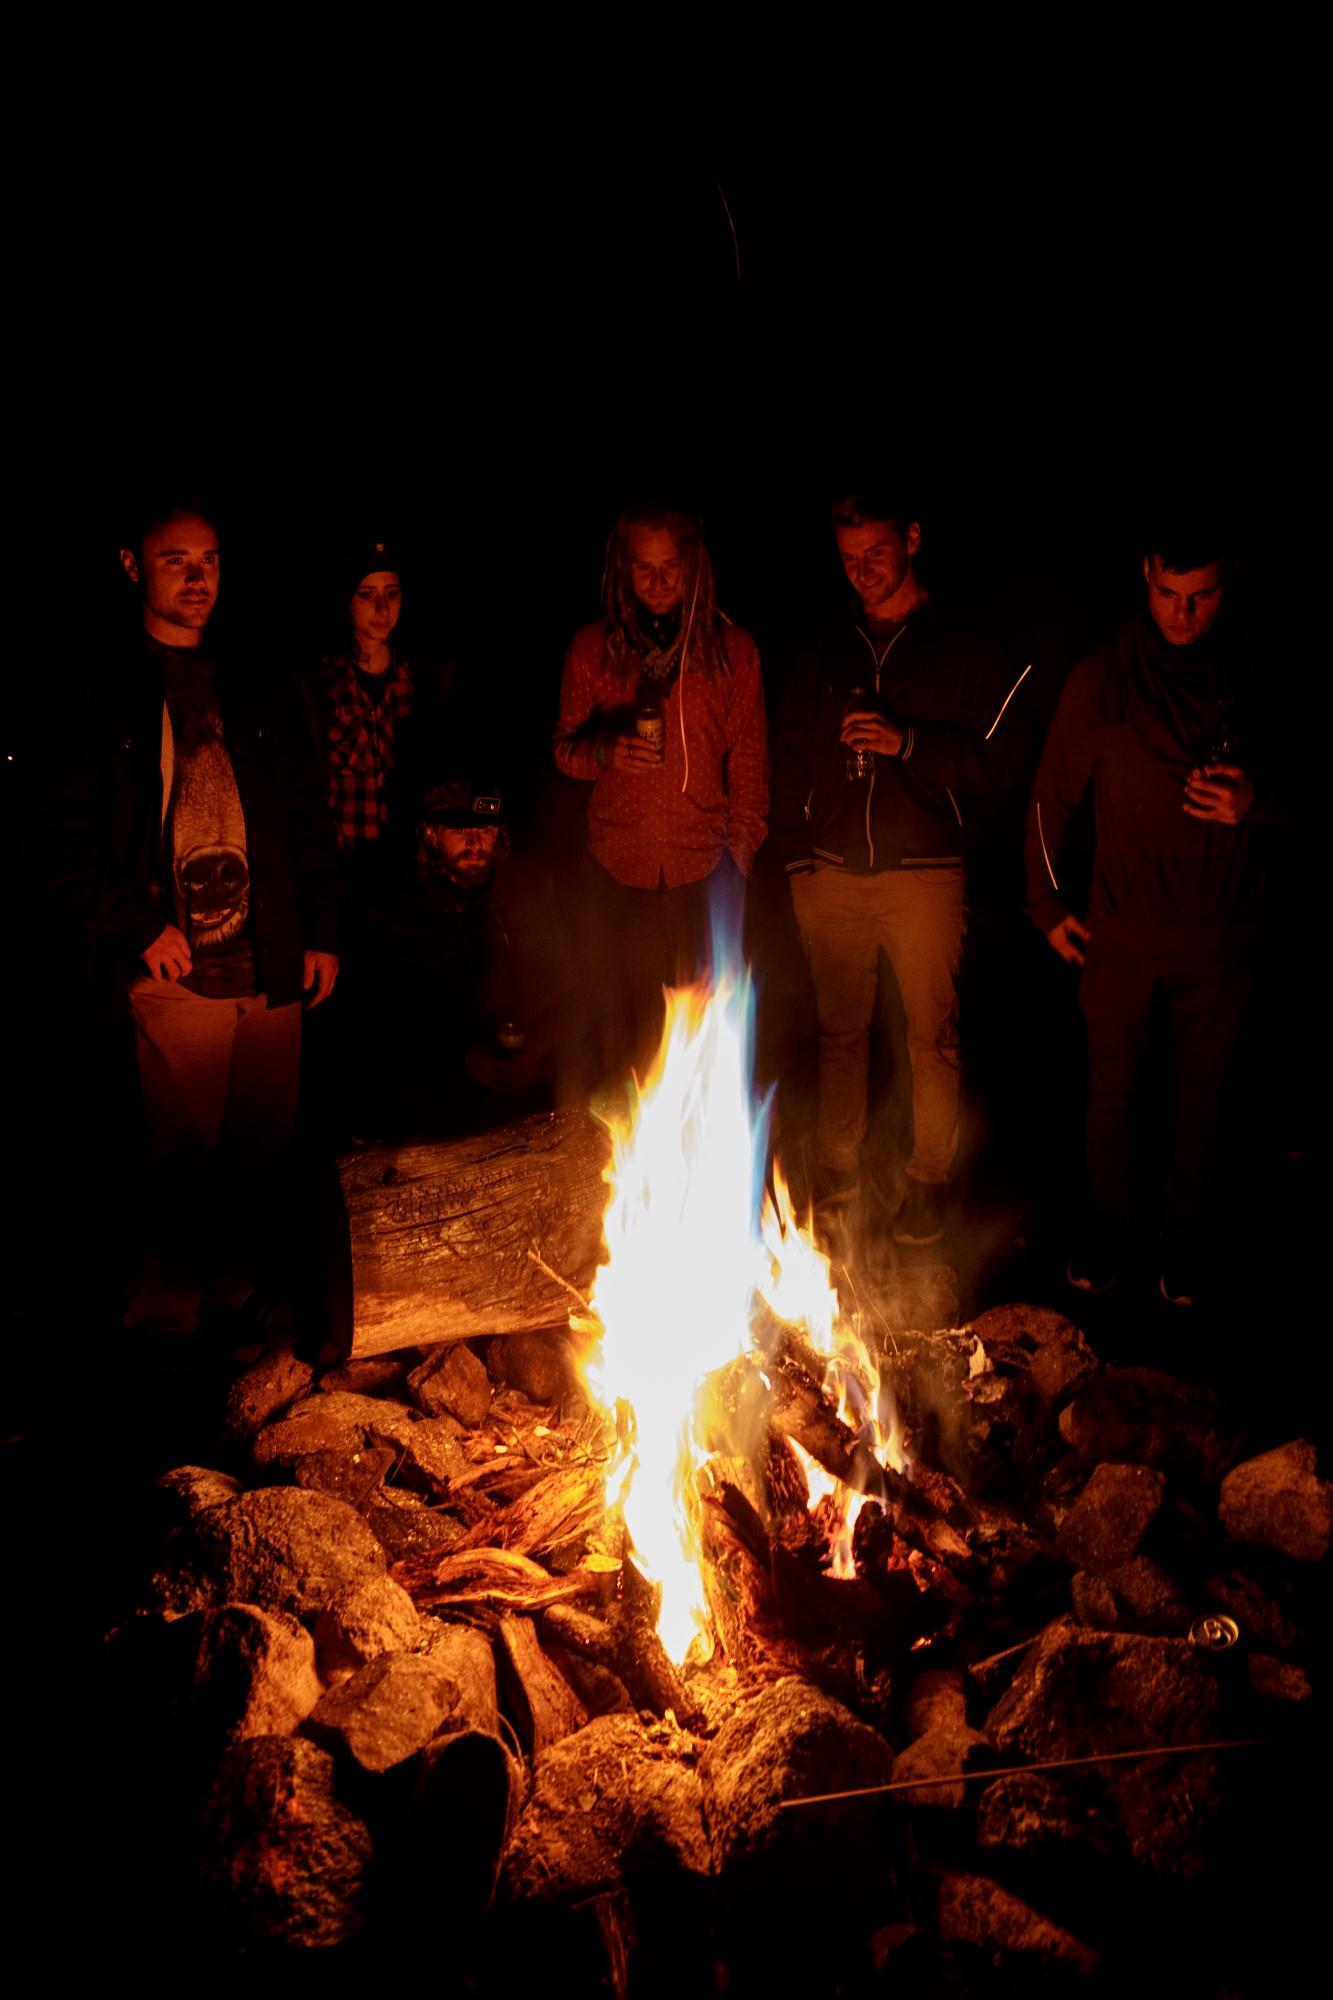 13-Colorado-Road-Trip-2016-Enjoying-The-Fire-Kuhn